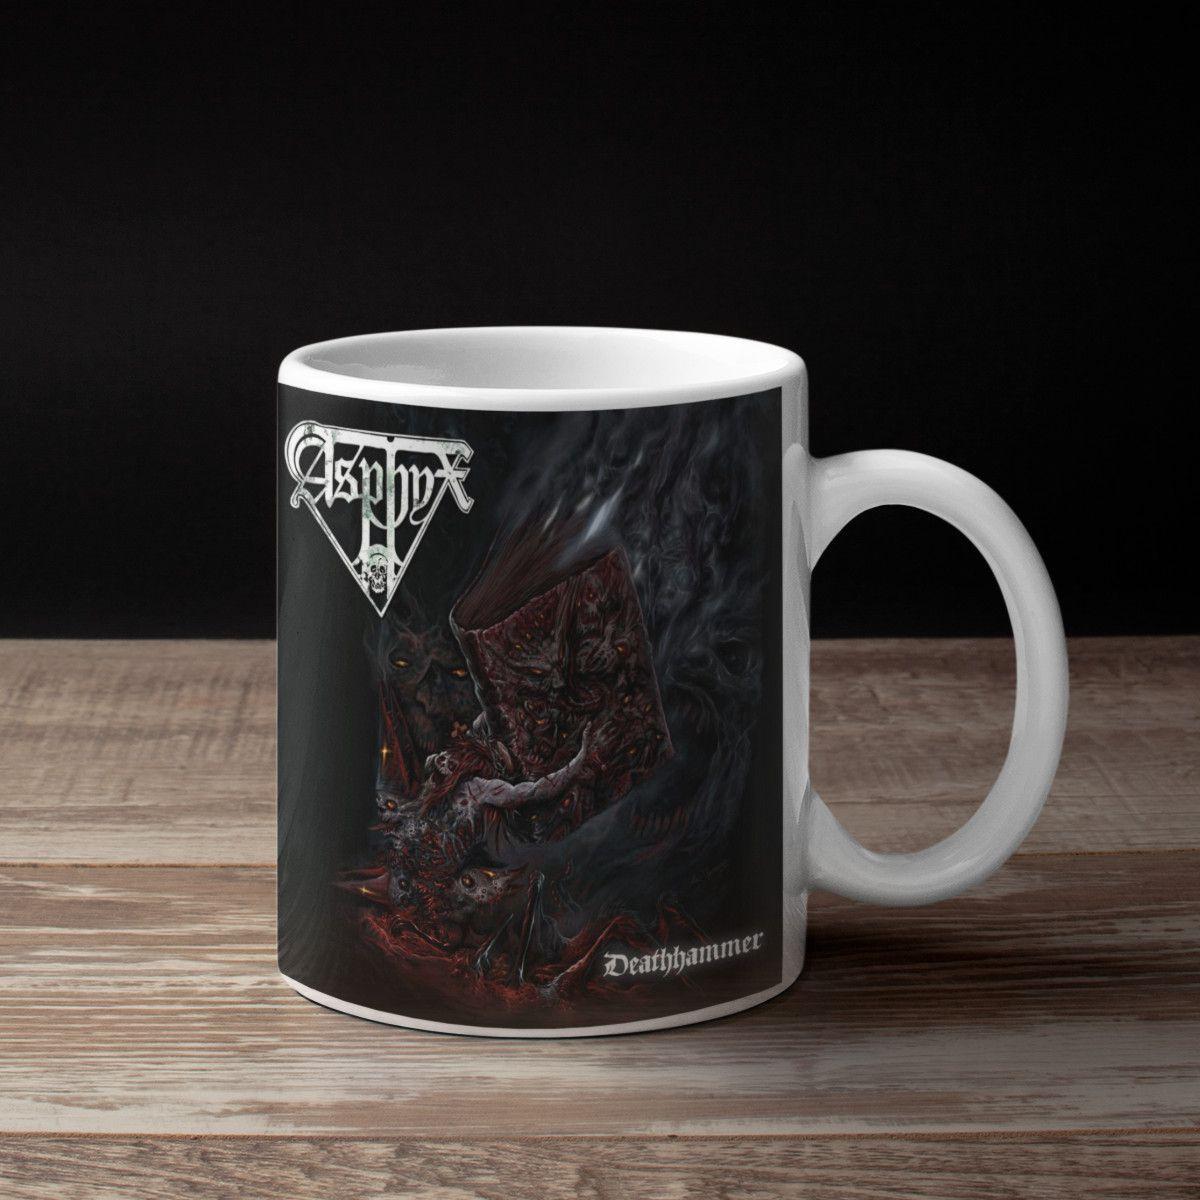 Asphyx Band Coffee Mug, Asphyx Deathhammer Cover Artwork ...